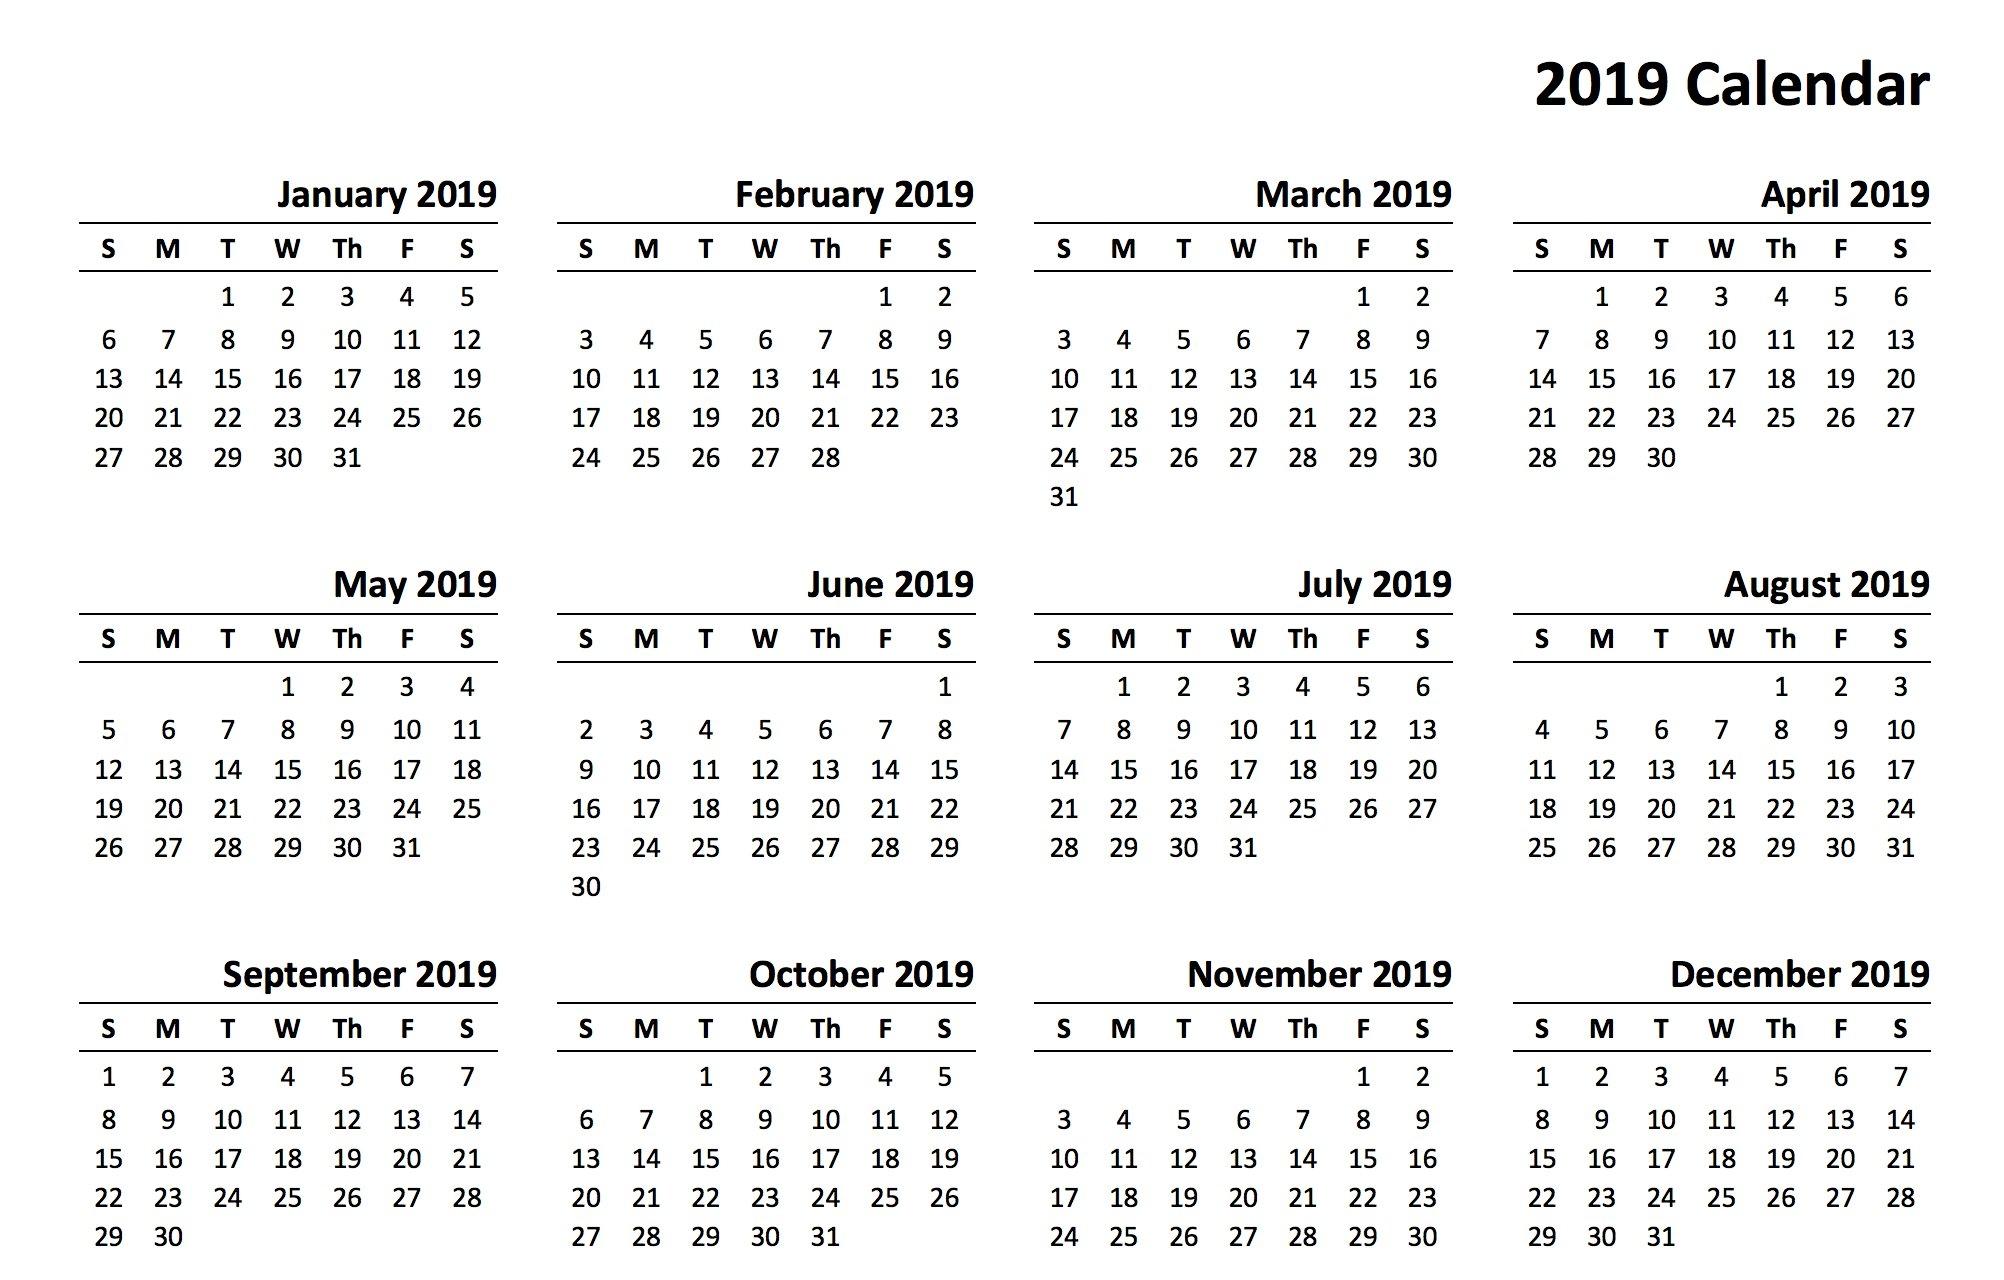 Printable 2019 Calendar | Aaron The Artist 2019 Calendars